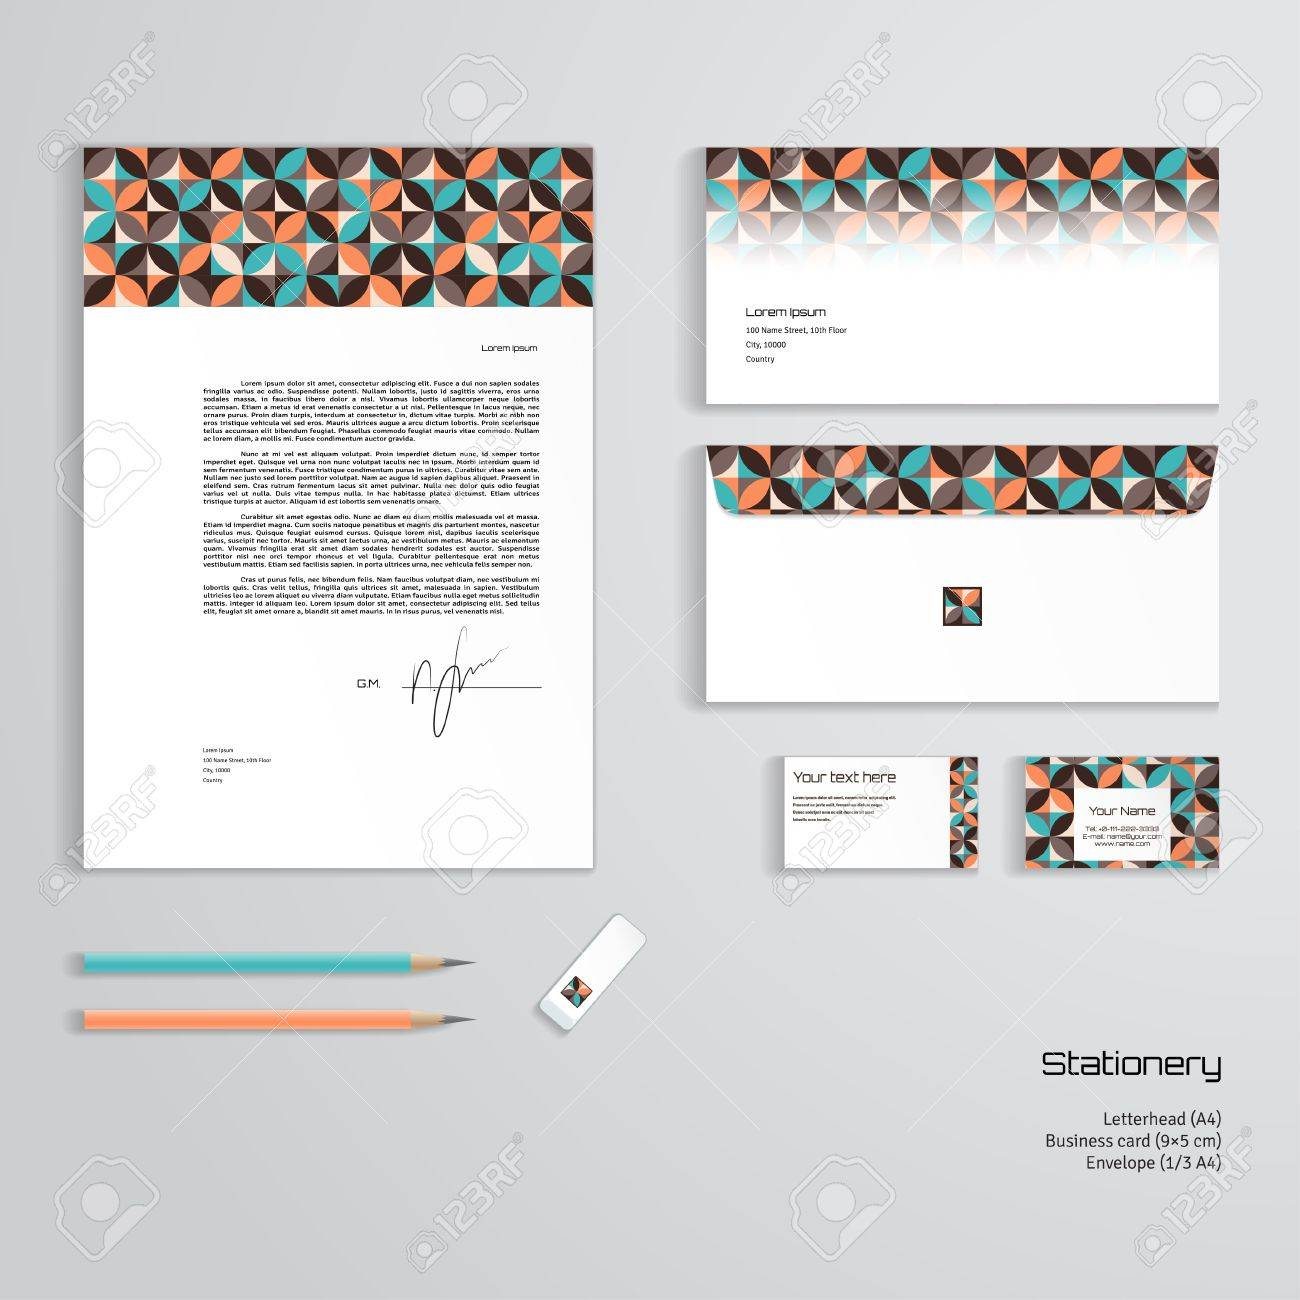 Business Card Letterhead Envelope Design Gallery - Card Design And ...